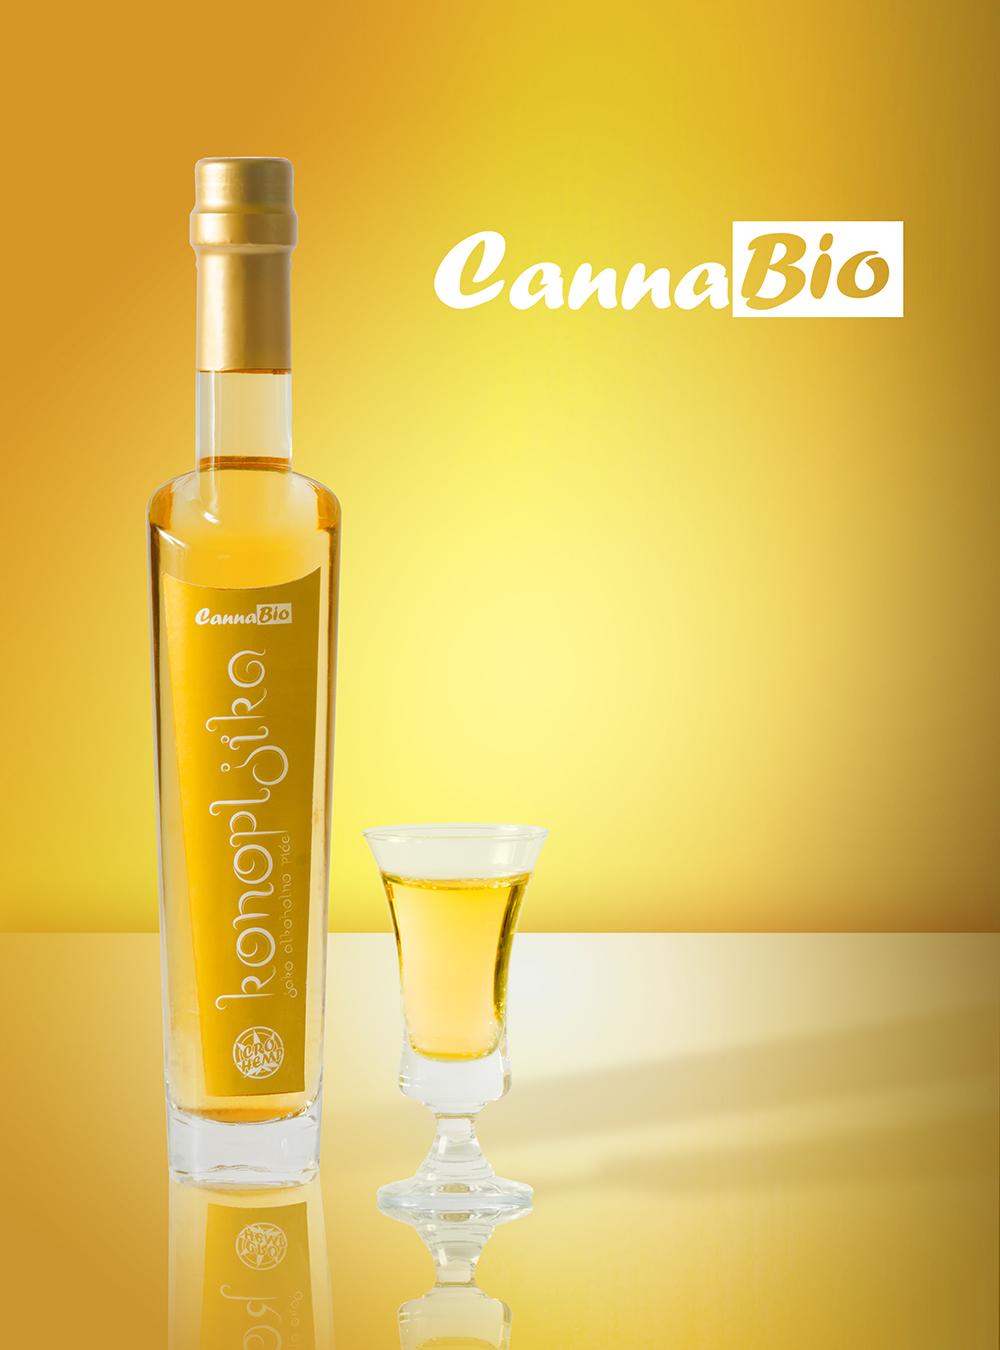 Cannabio